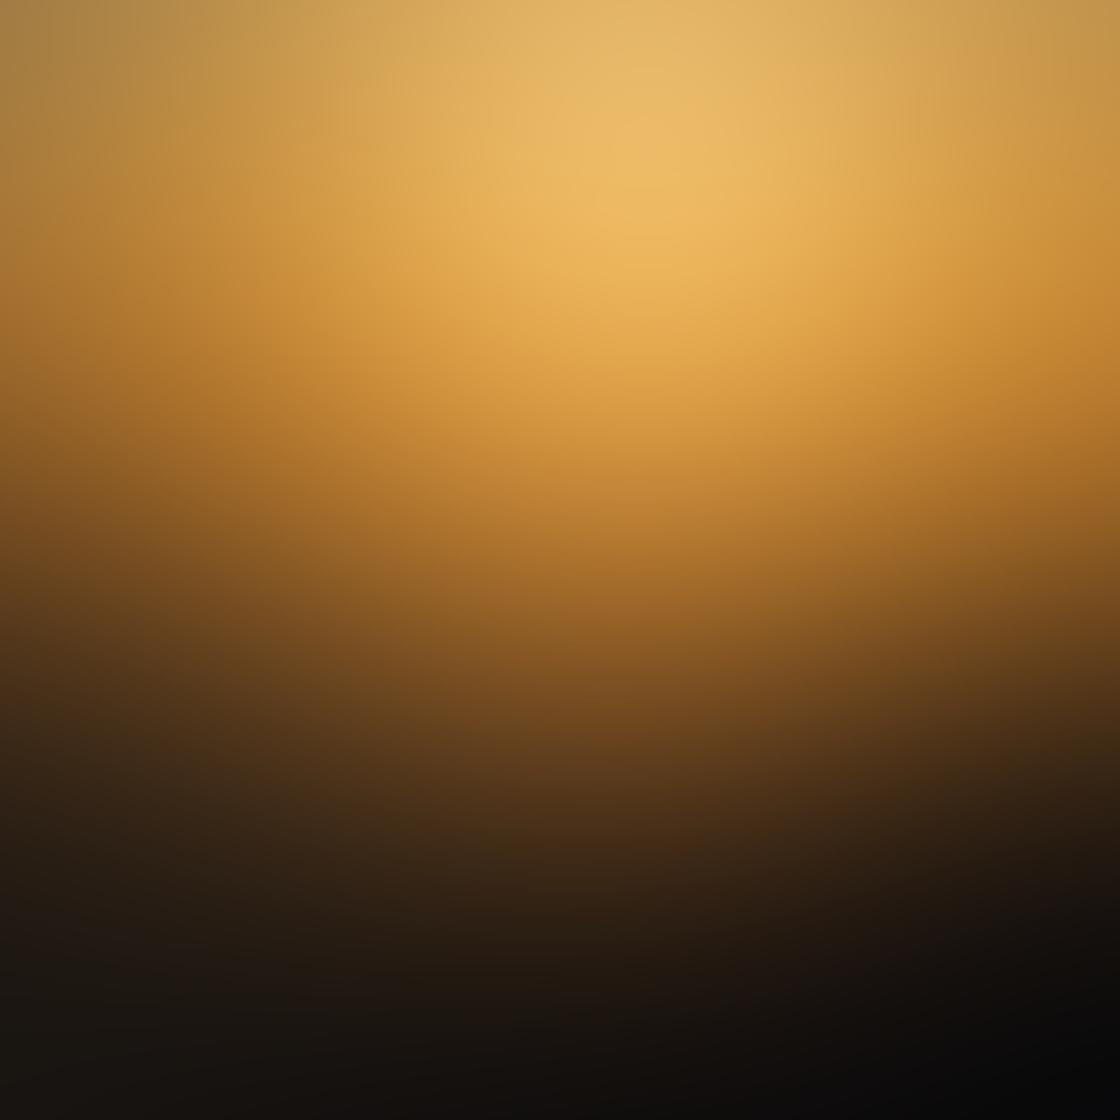 iPhone Angle Photo 09